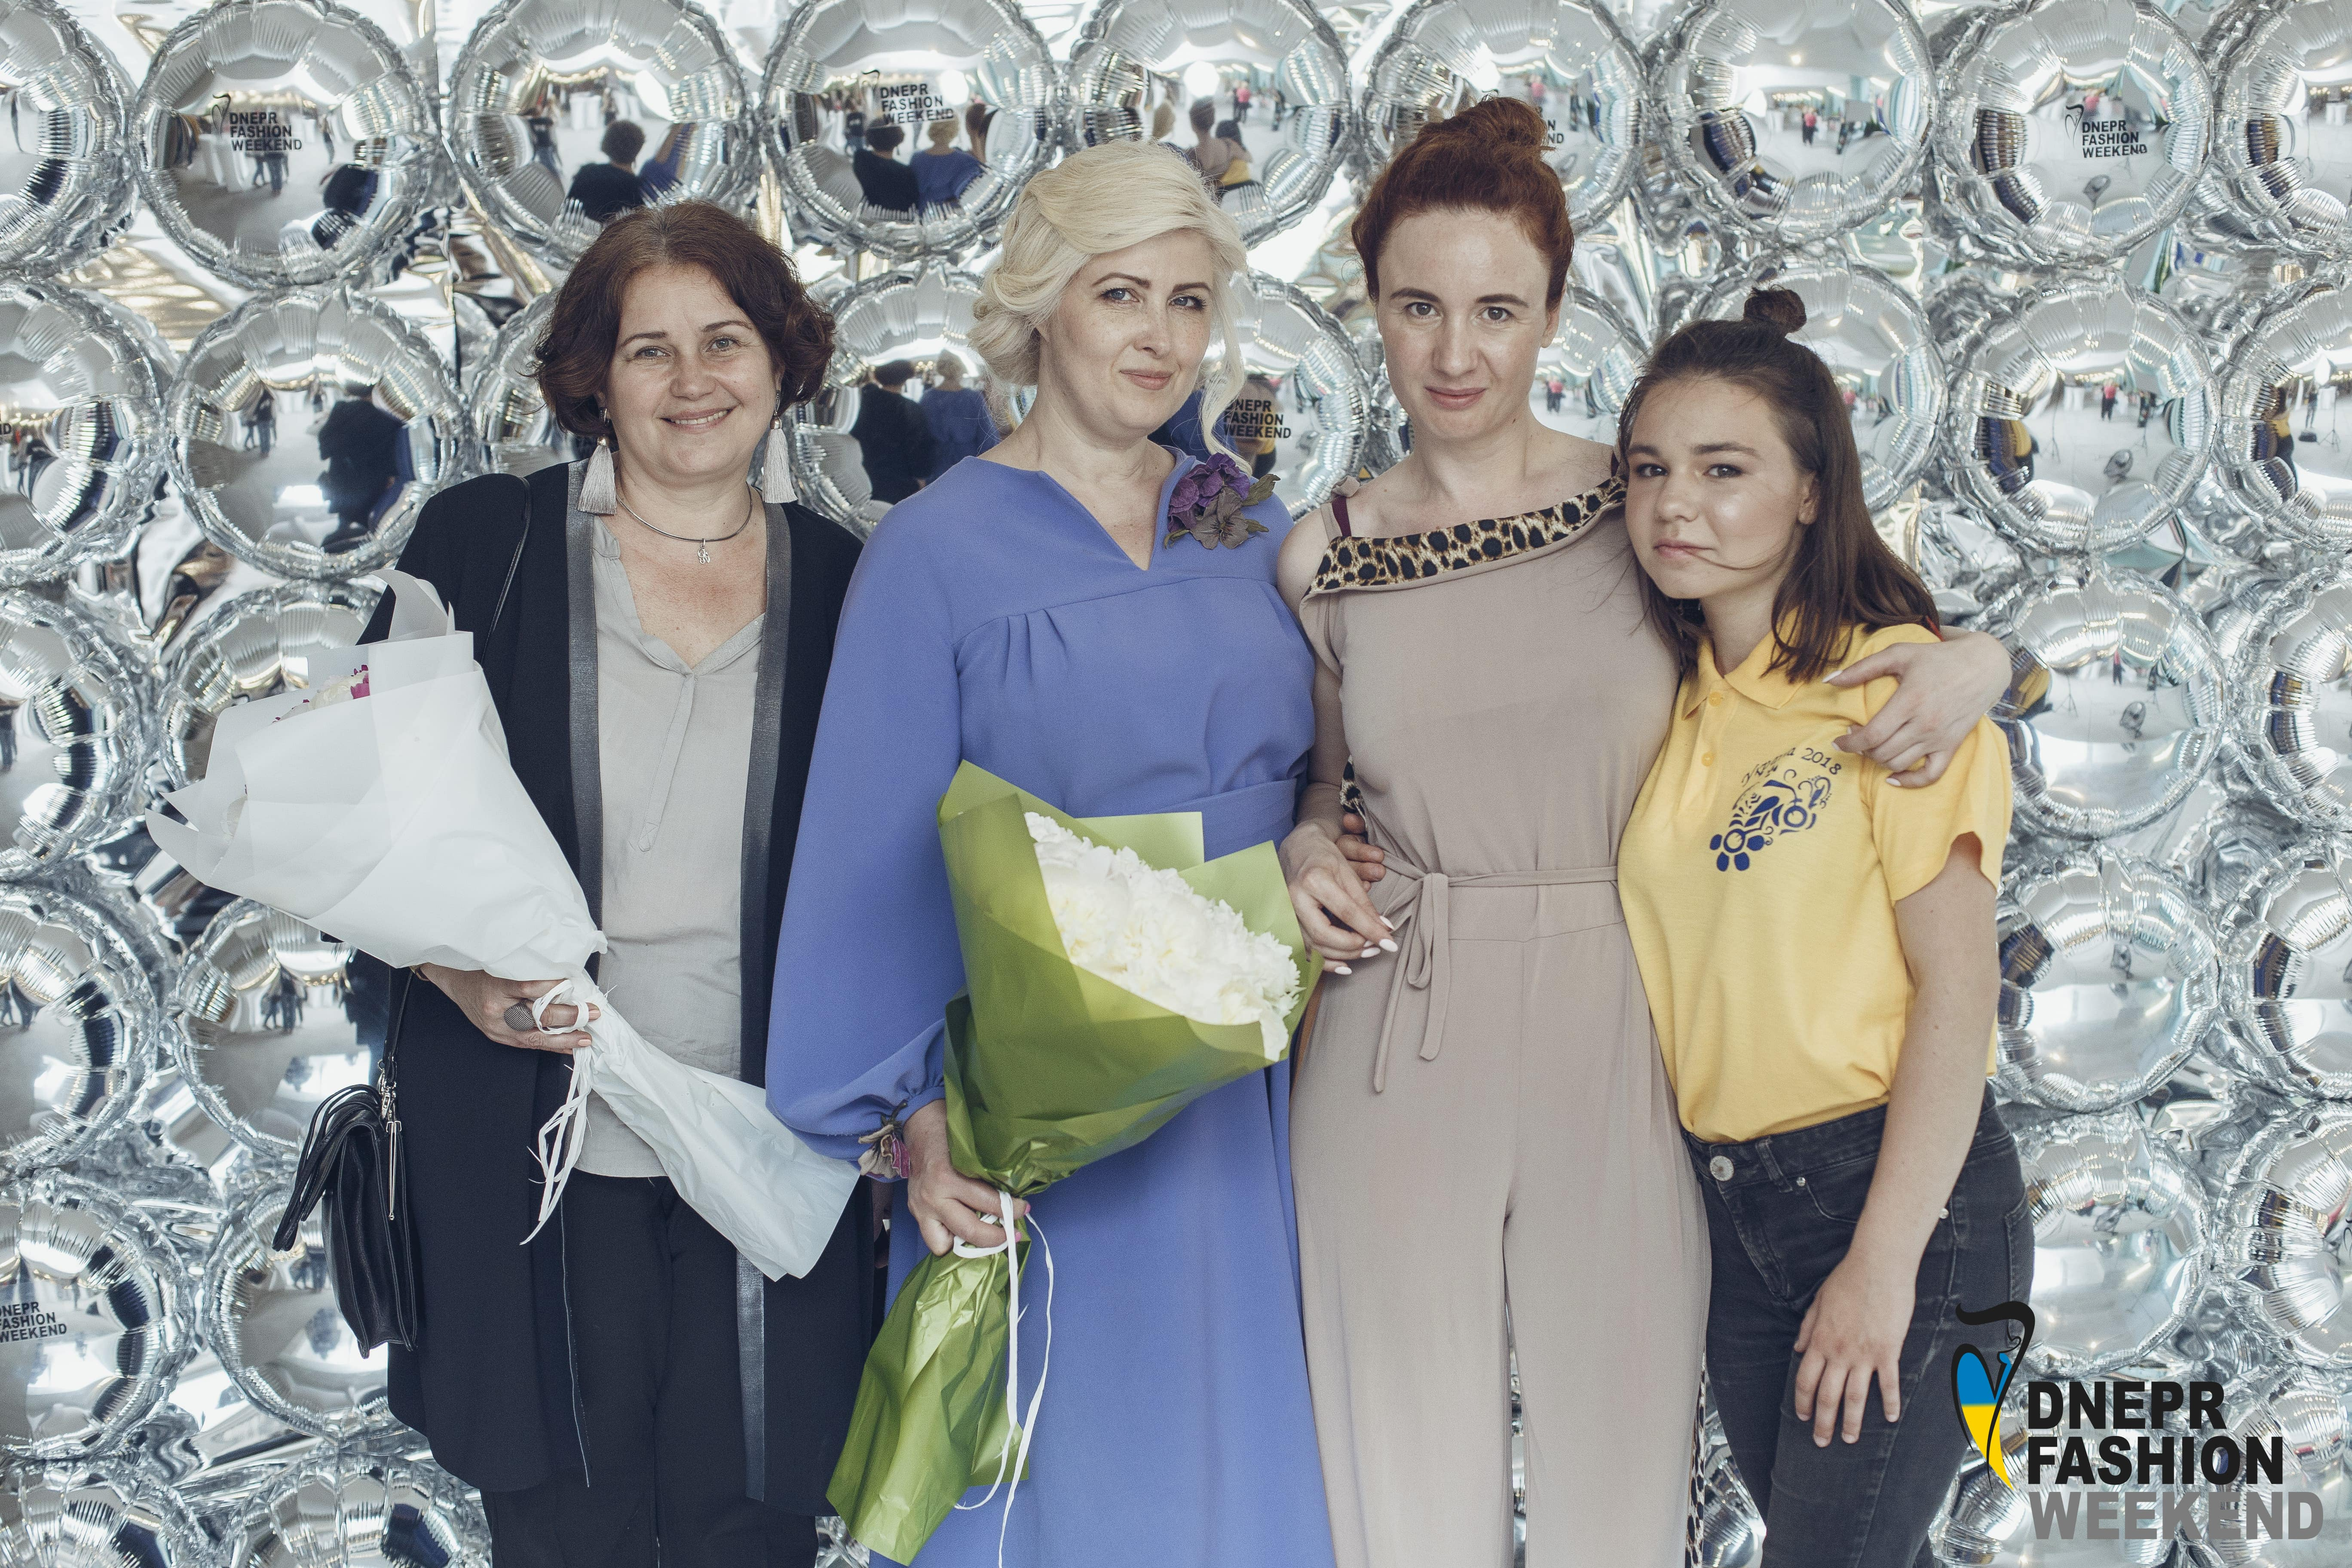 Хроники Dnepr Fashion Weekend как прошли три дня модного мероприятия 2